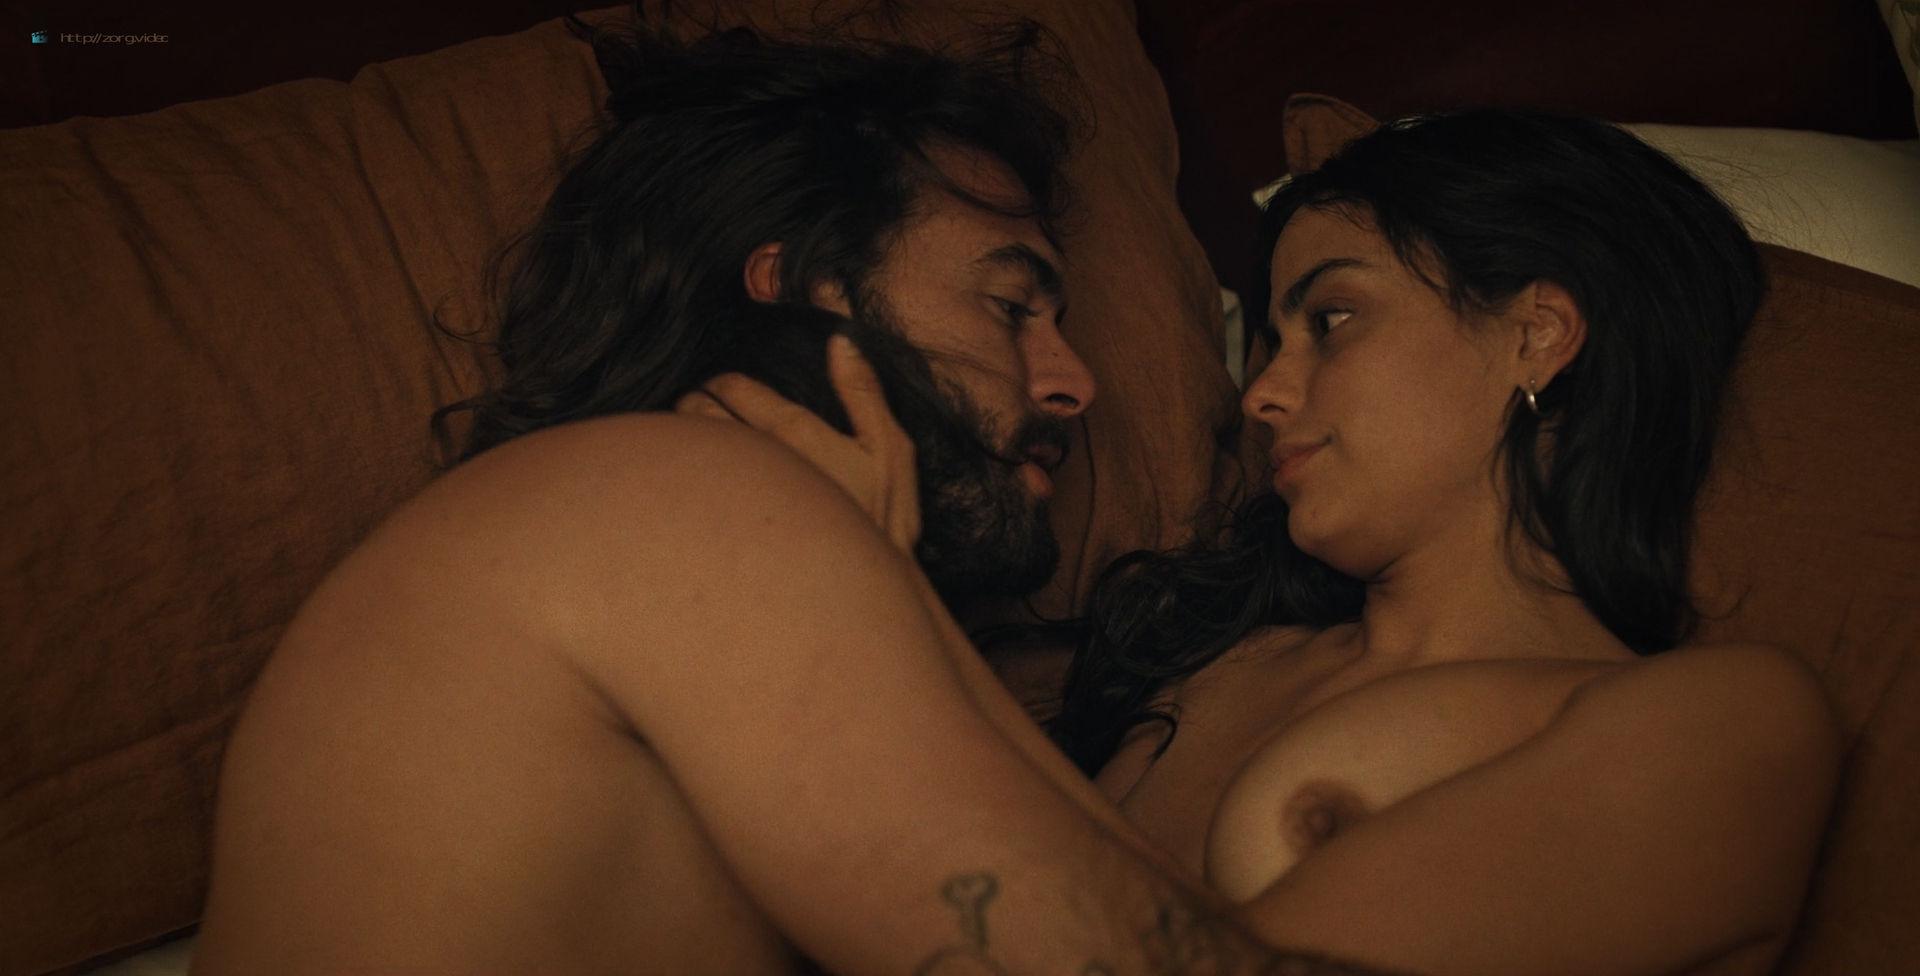 Ana Layevska nude lesbian sex with Florencia Ríos - Yankee (2019) S1 HD 1080p (4)